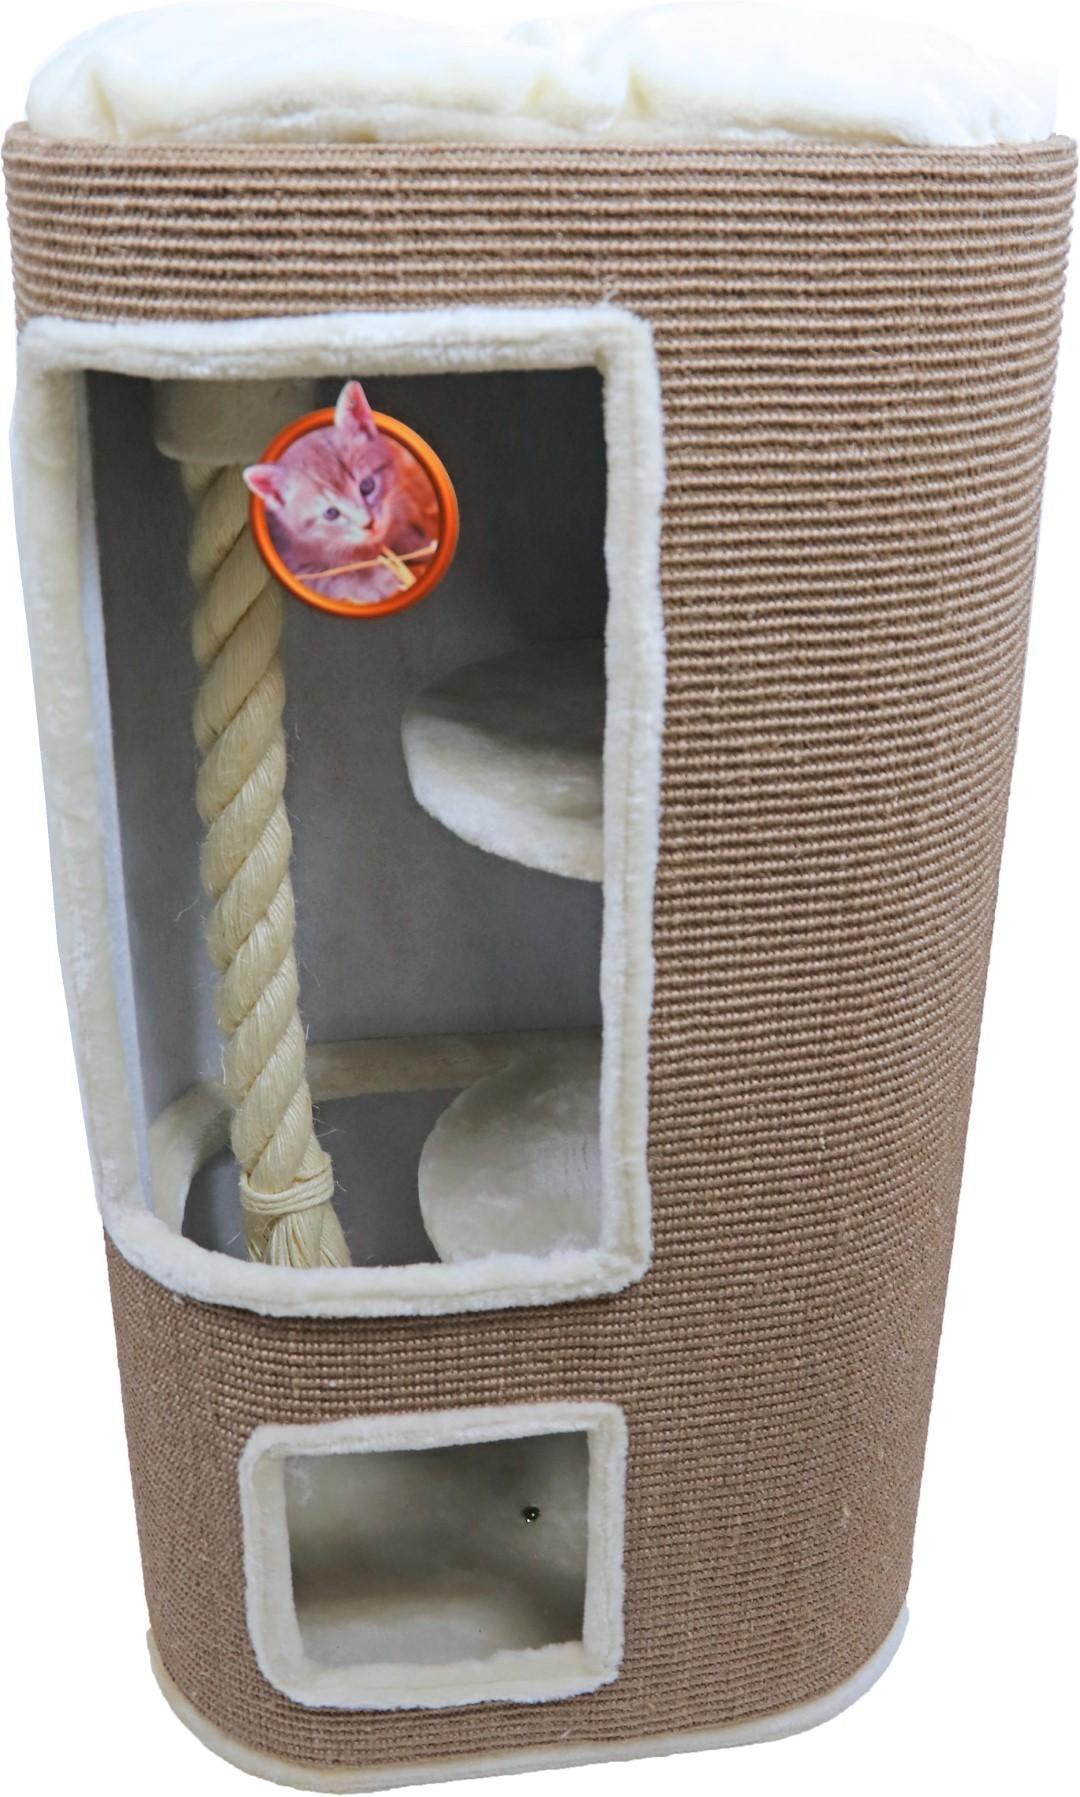 Klimton sisal ovaal 2-gaats 100 cm taupe/creme